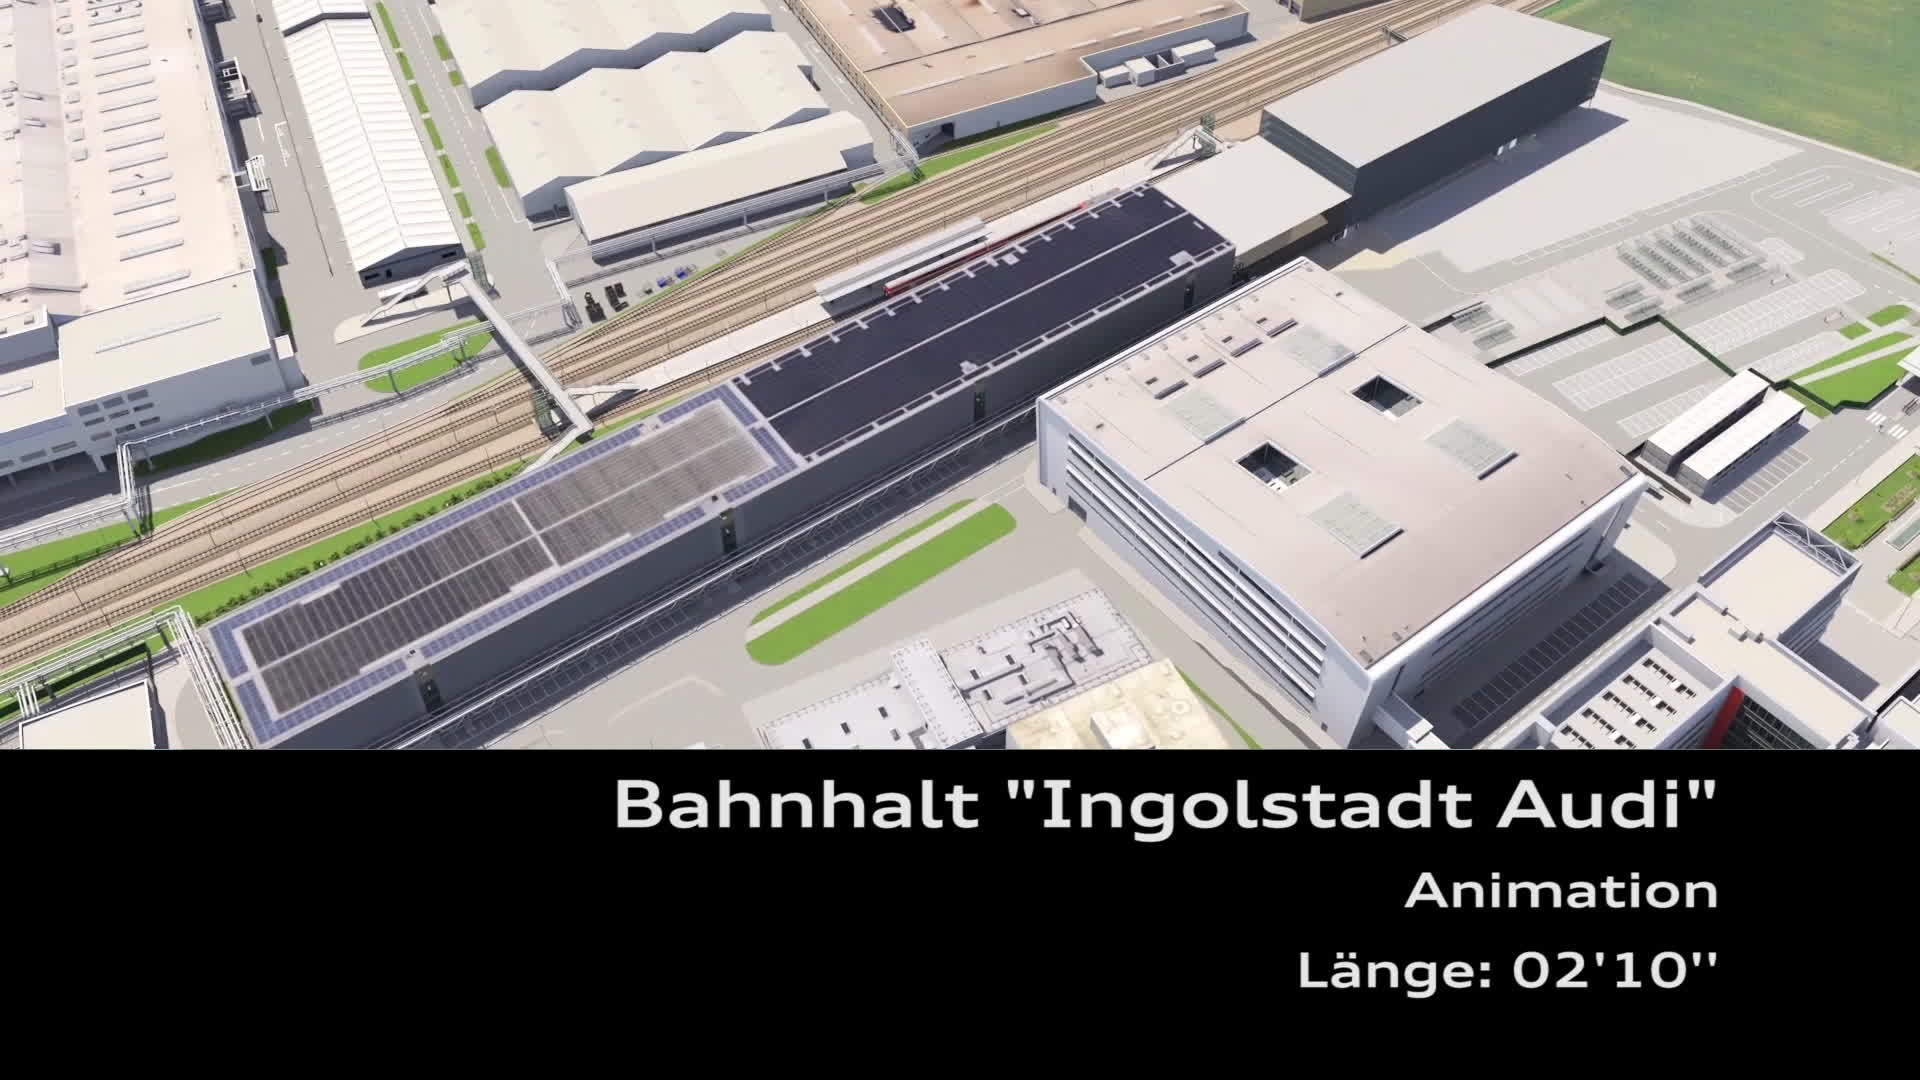 Bahnhalt Ingolstadt Audi Animation